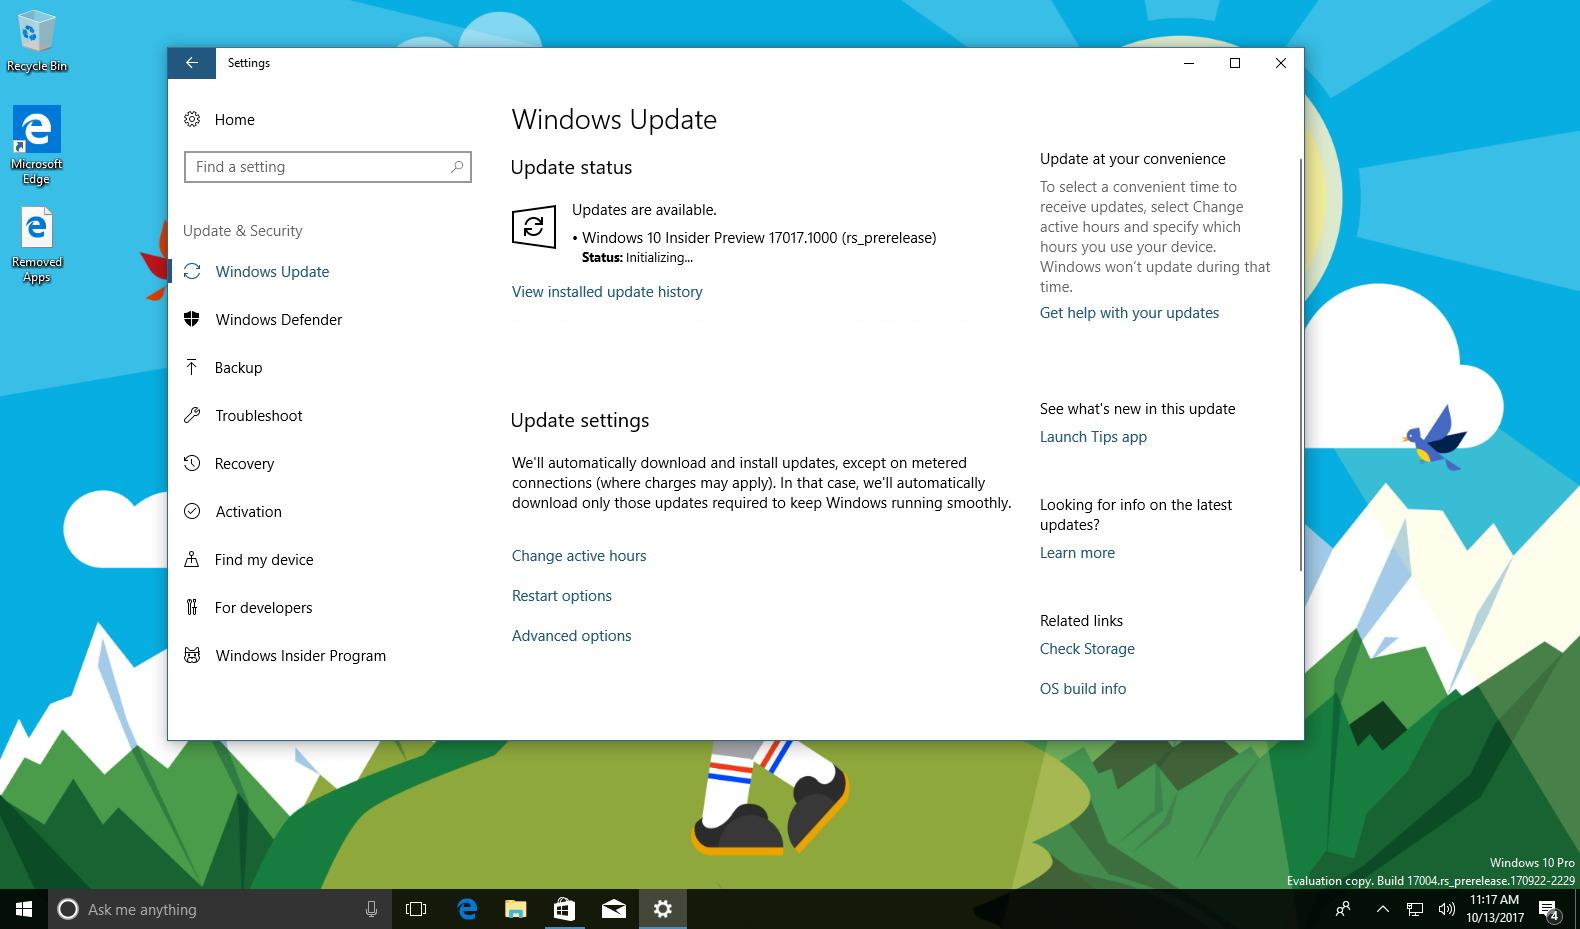 Windows 10 build 17017